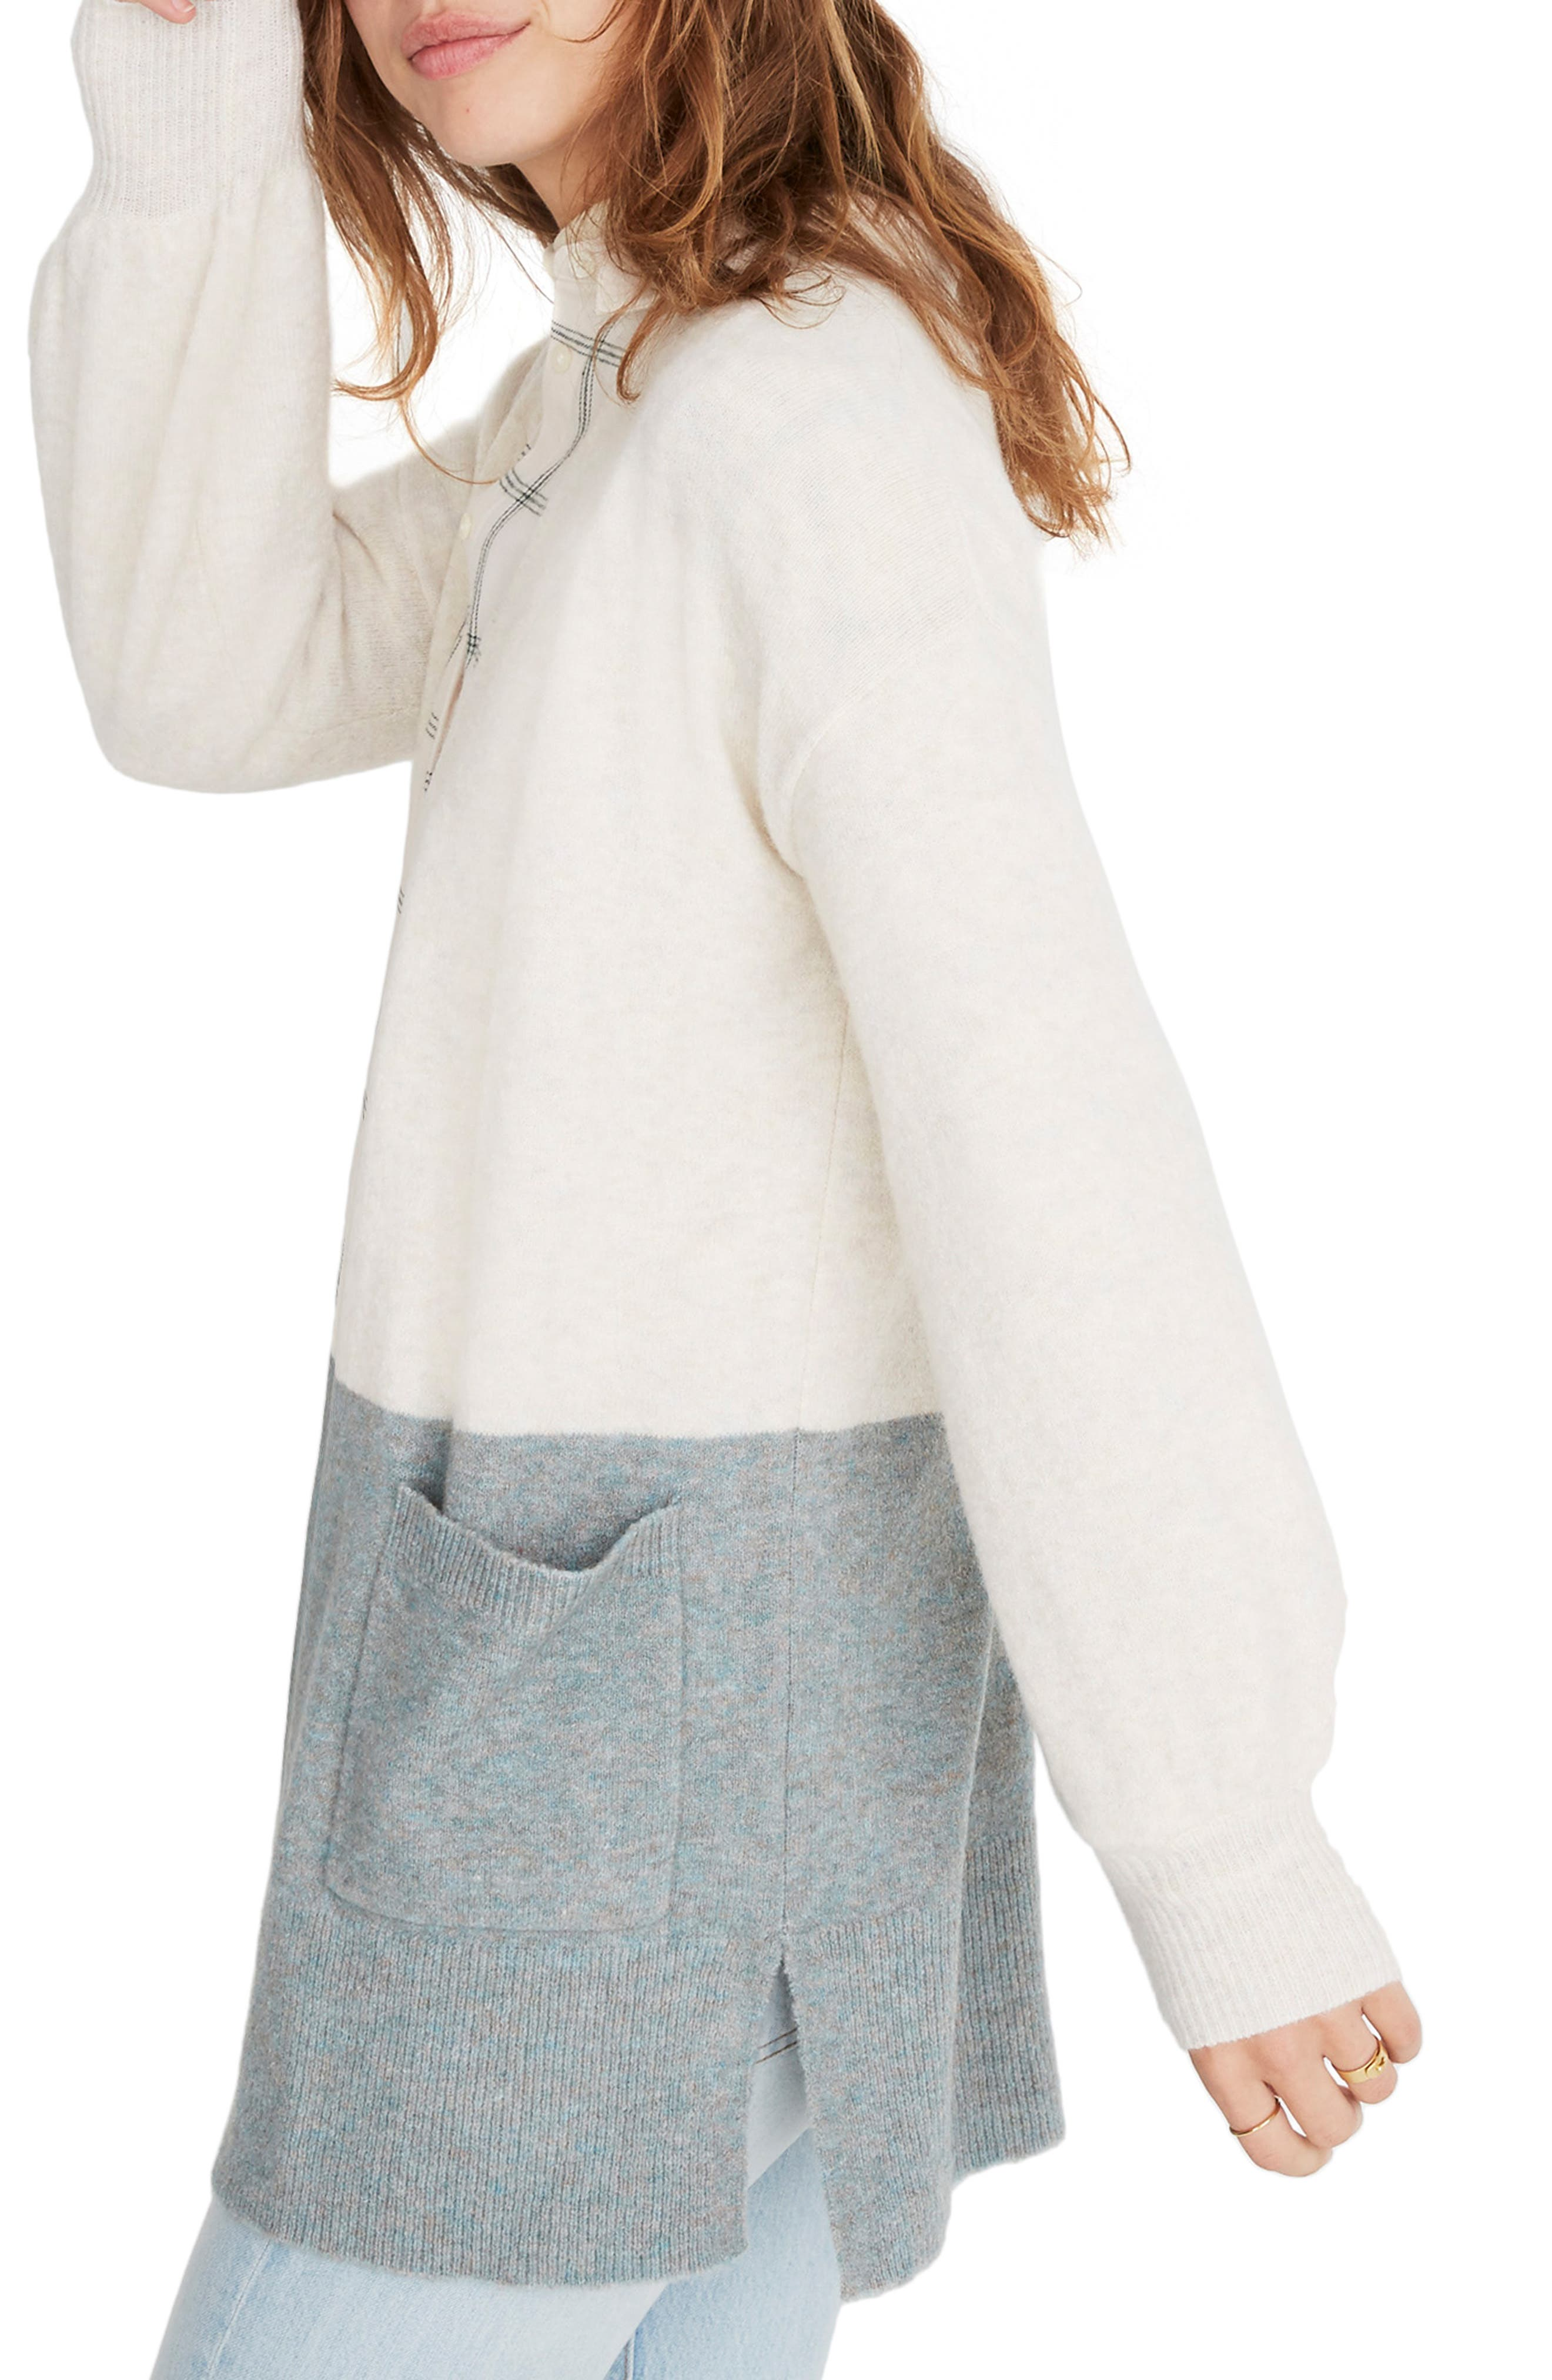 Kent Colorblock Cardigan Sweater,                             Alternate thumbnail 3, color,                             HEATHER RIVER